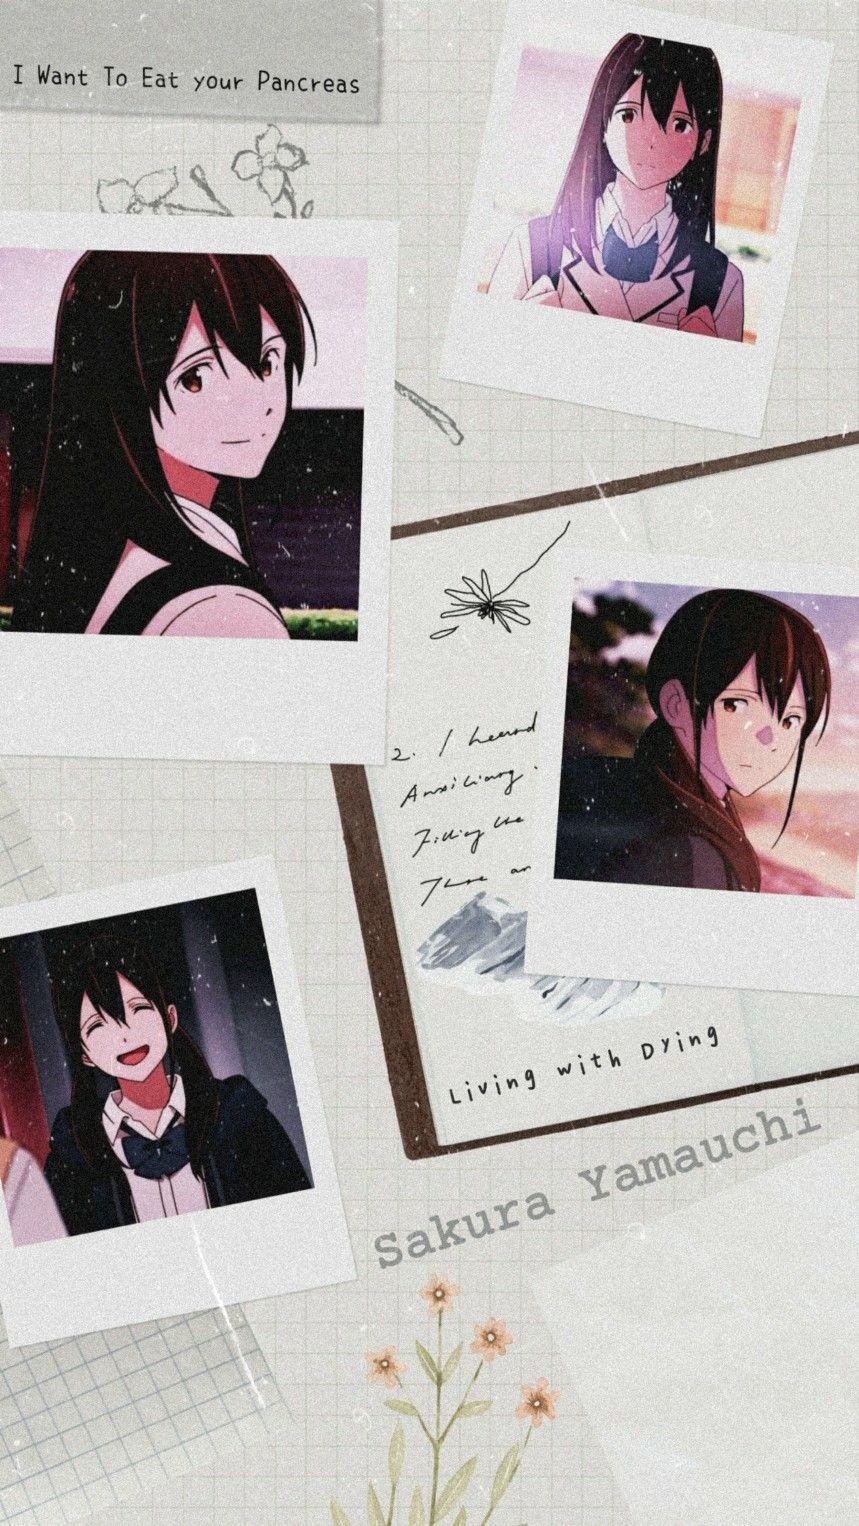 Sakura Yamauchi Anime Classroom Cute Anime Wallpaper Sakura Yamauchi Wallpaper